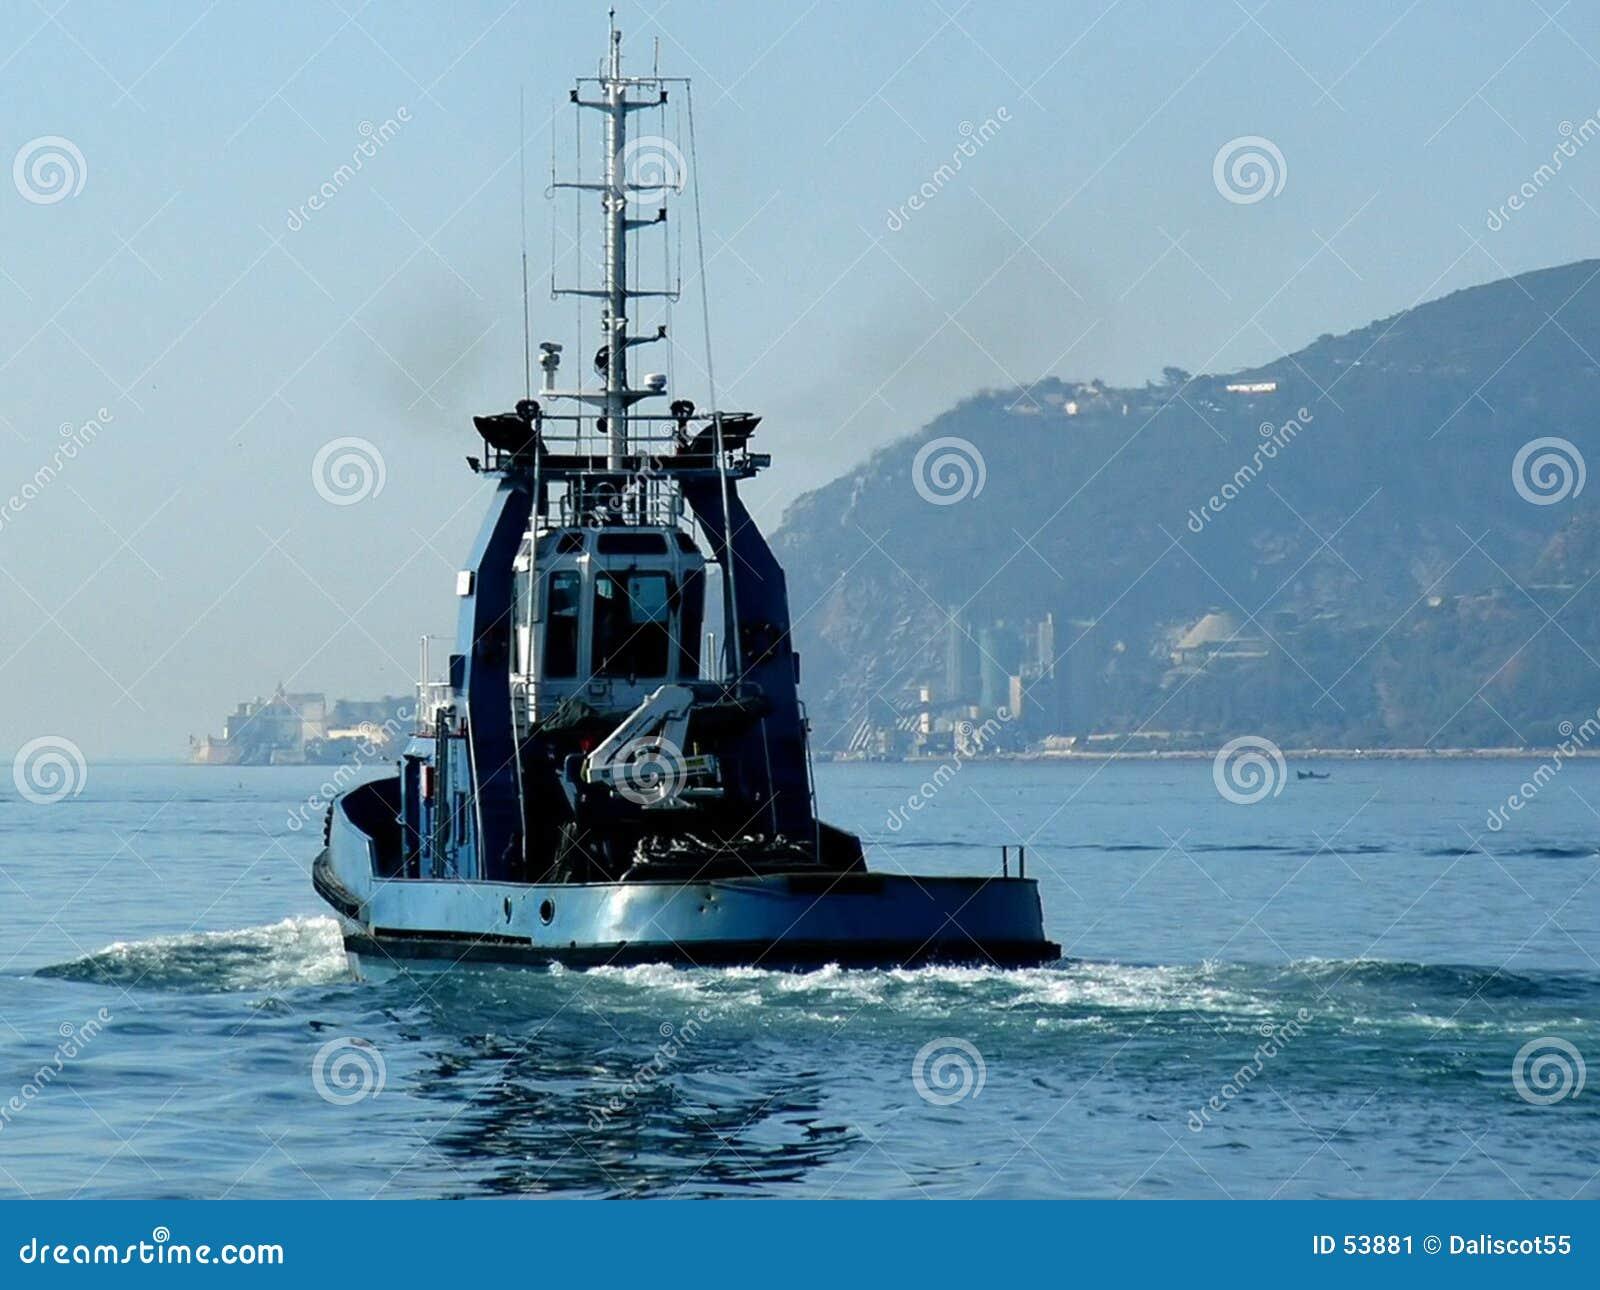 Download Traction Subite Vers La Mer Image stock - Image du montagne, sillage: 53881